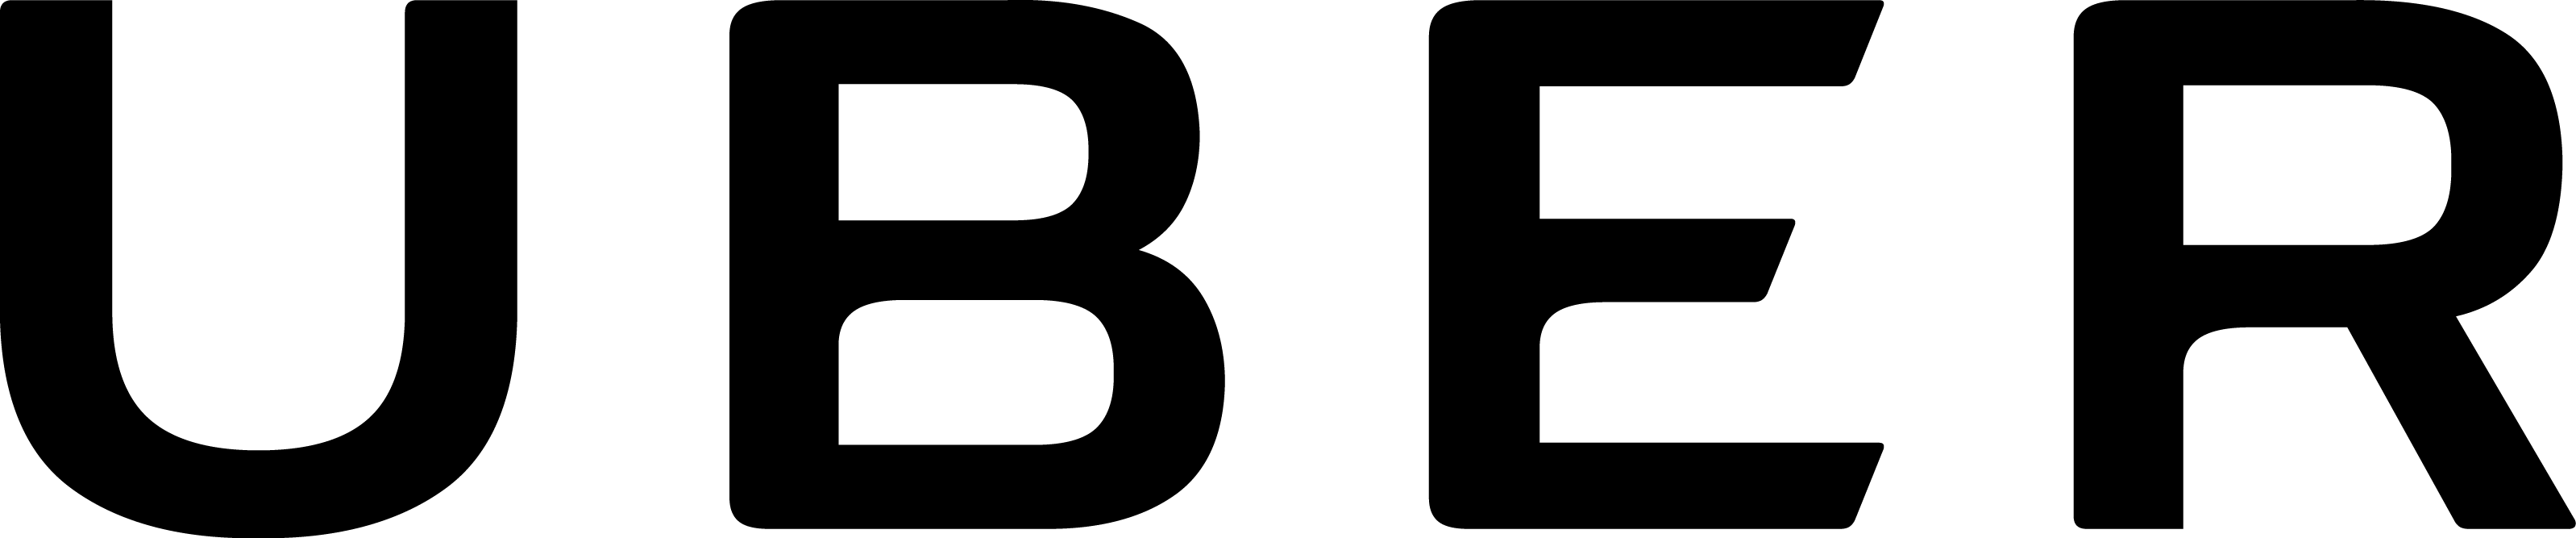 Customer Logo #1 of EasyLeadz